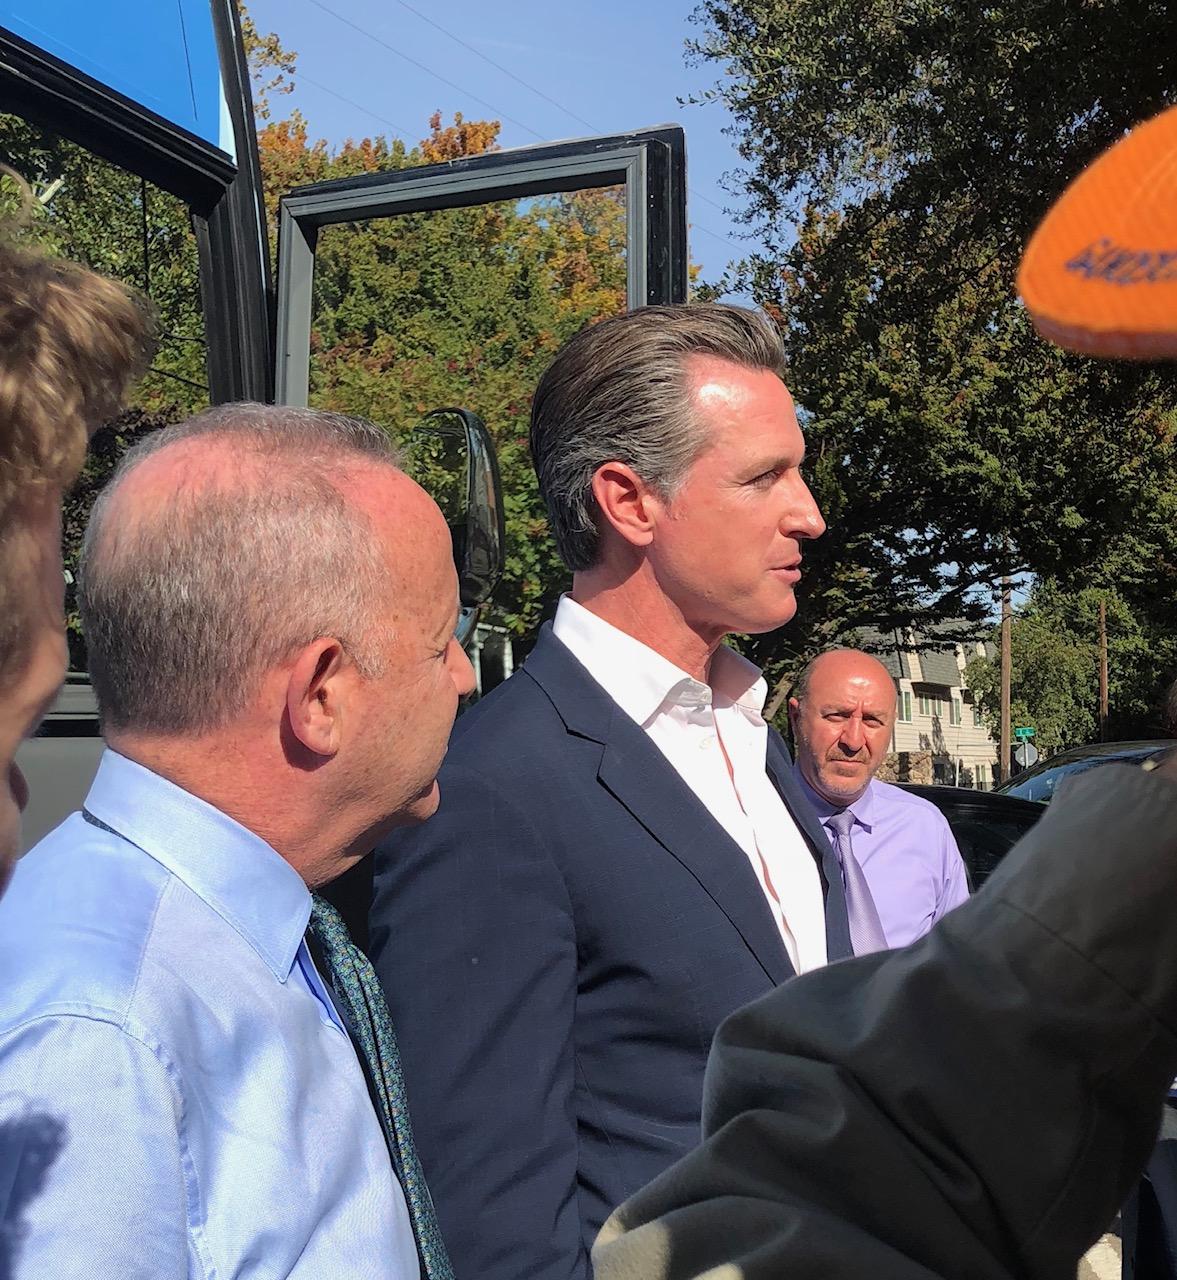 Gov. Gavin Newsom and Mayor Darrell Steinberg visit a Sacramento preschool on Oct. 31.